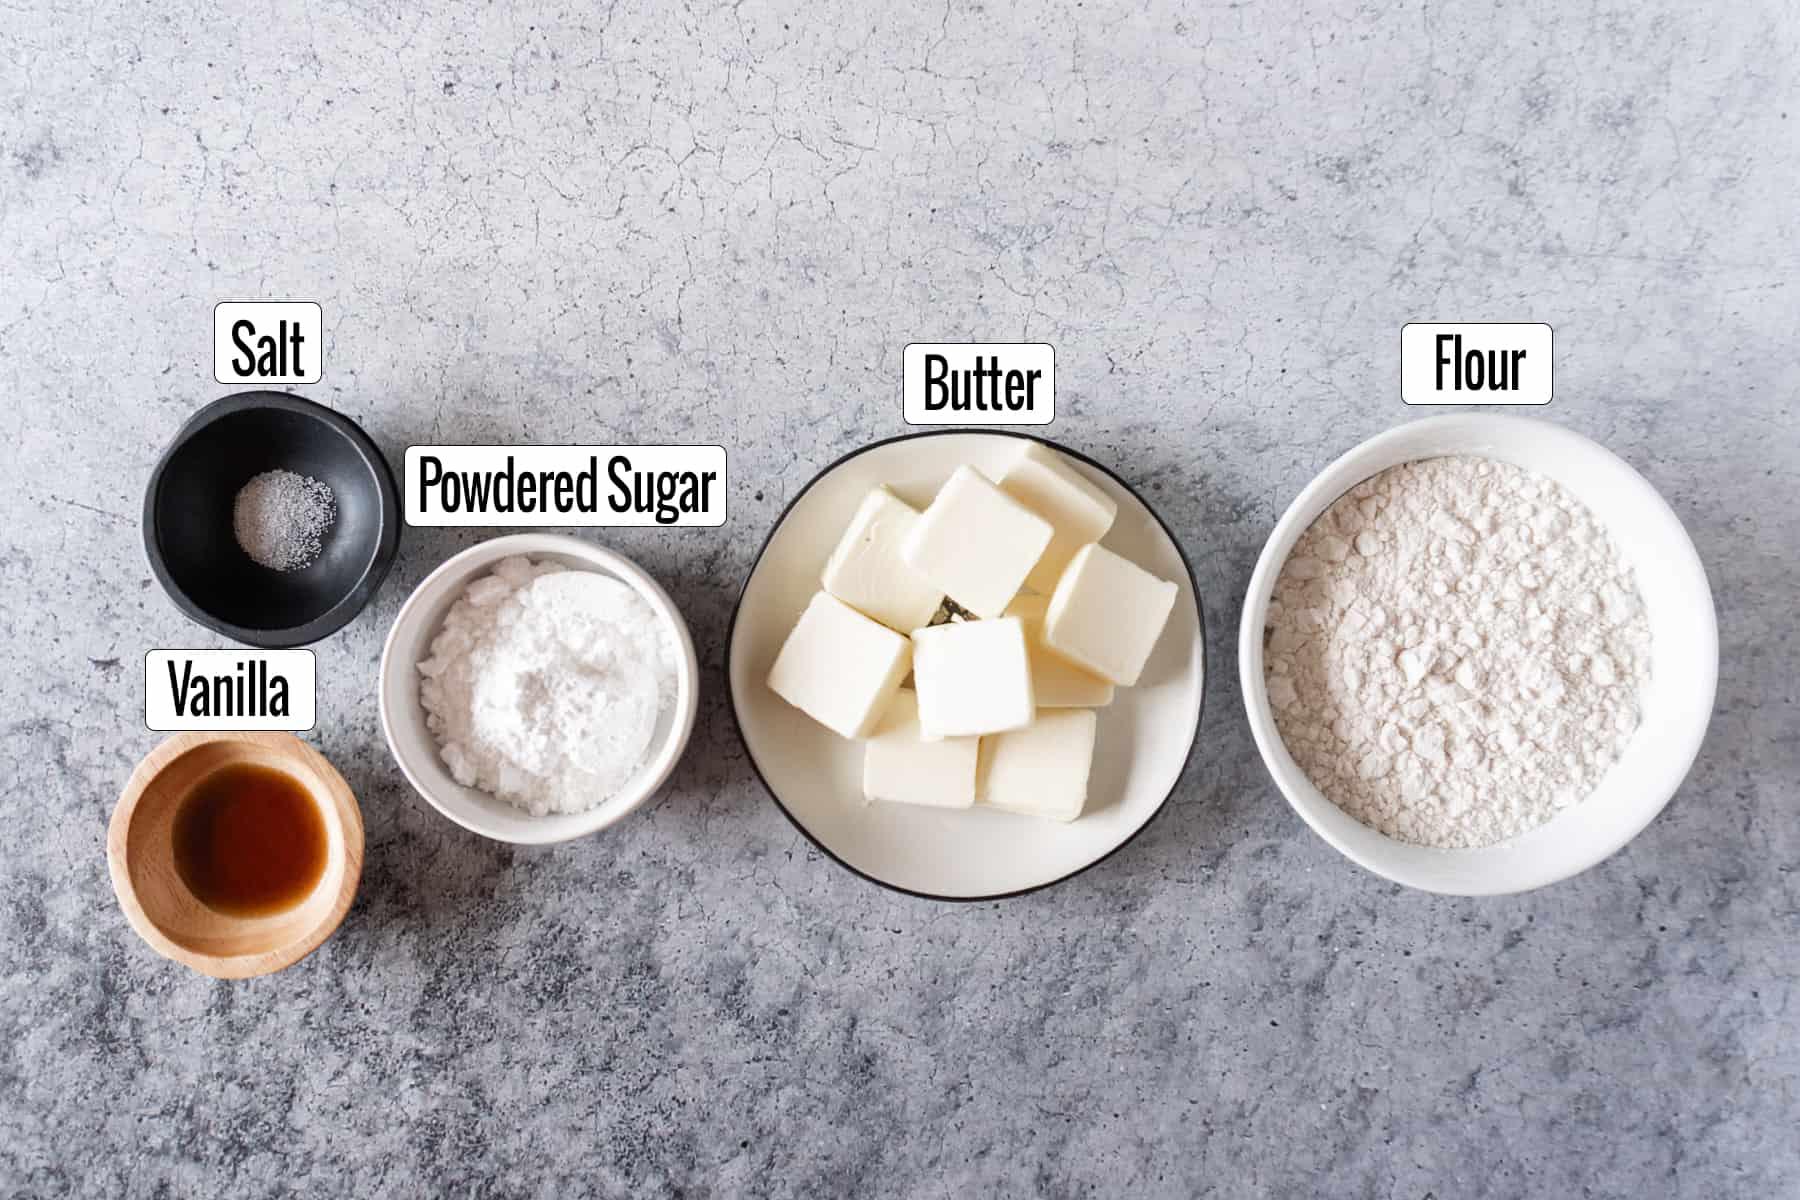 lemon bar crust ingredients salt, vanilla, powdered sugar, butter, flour